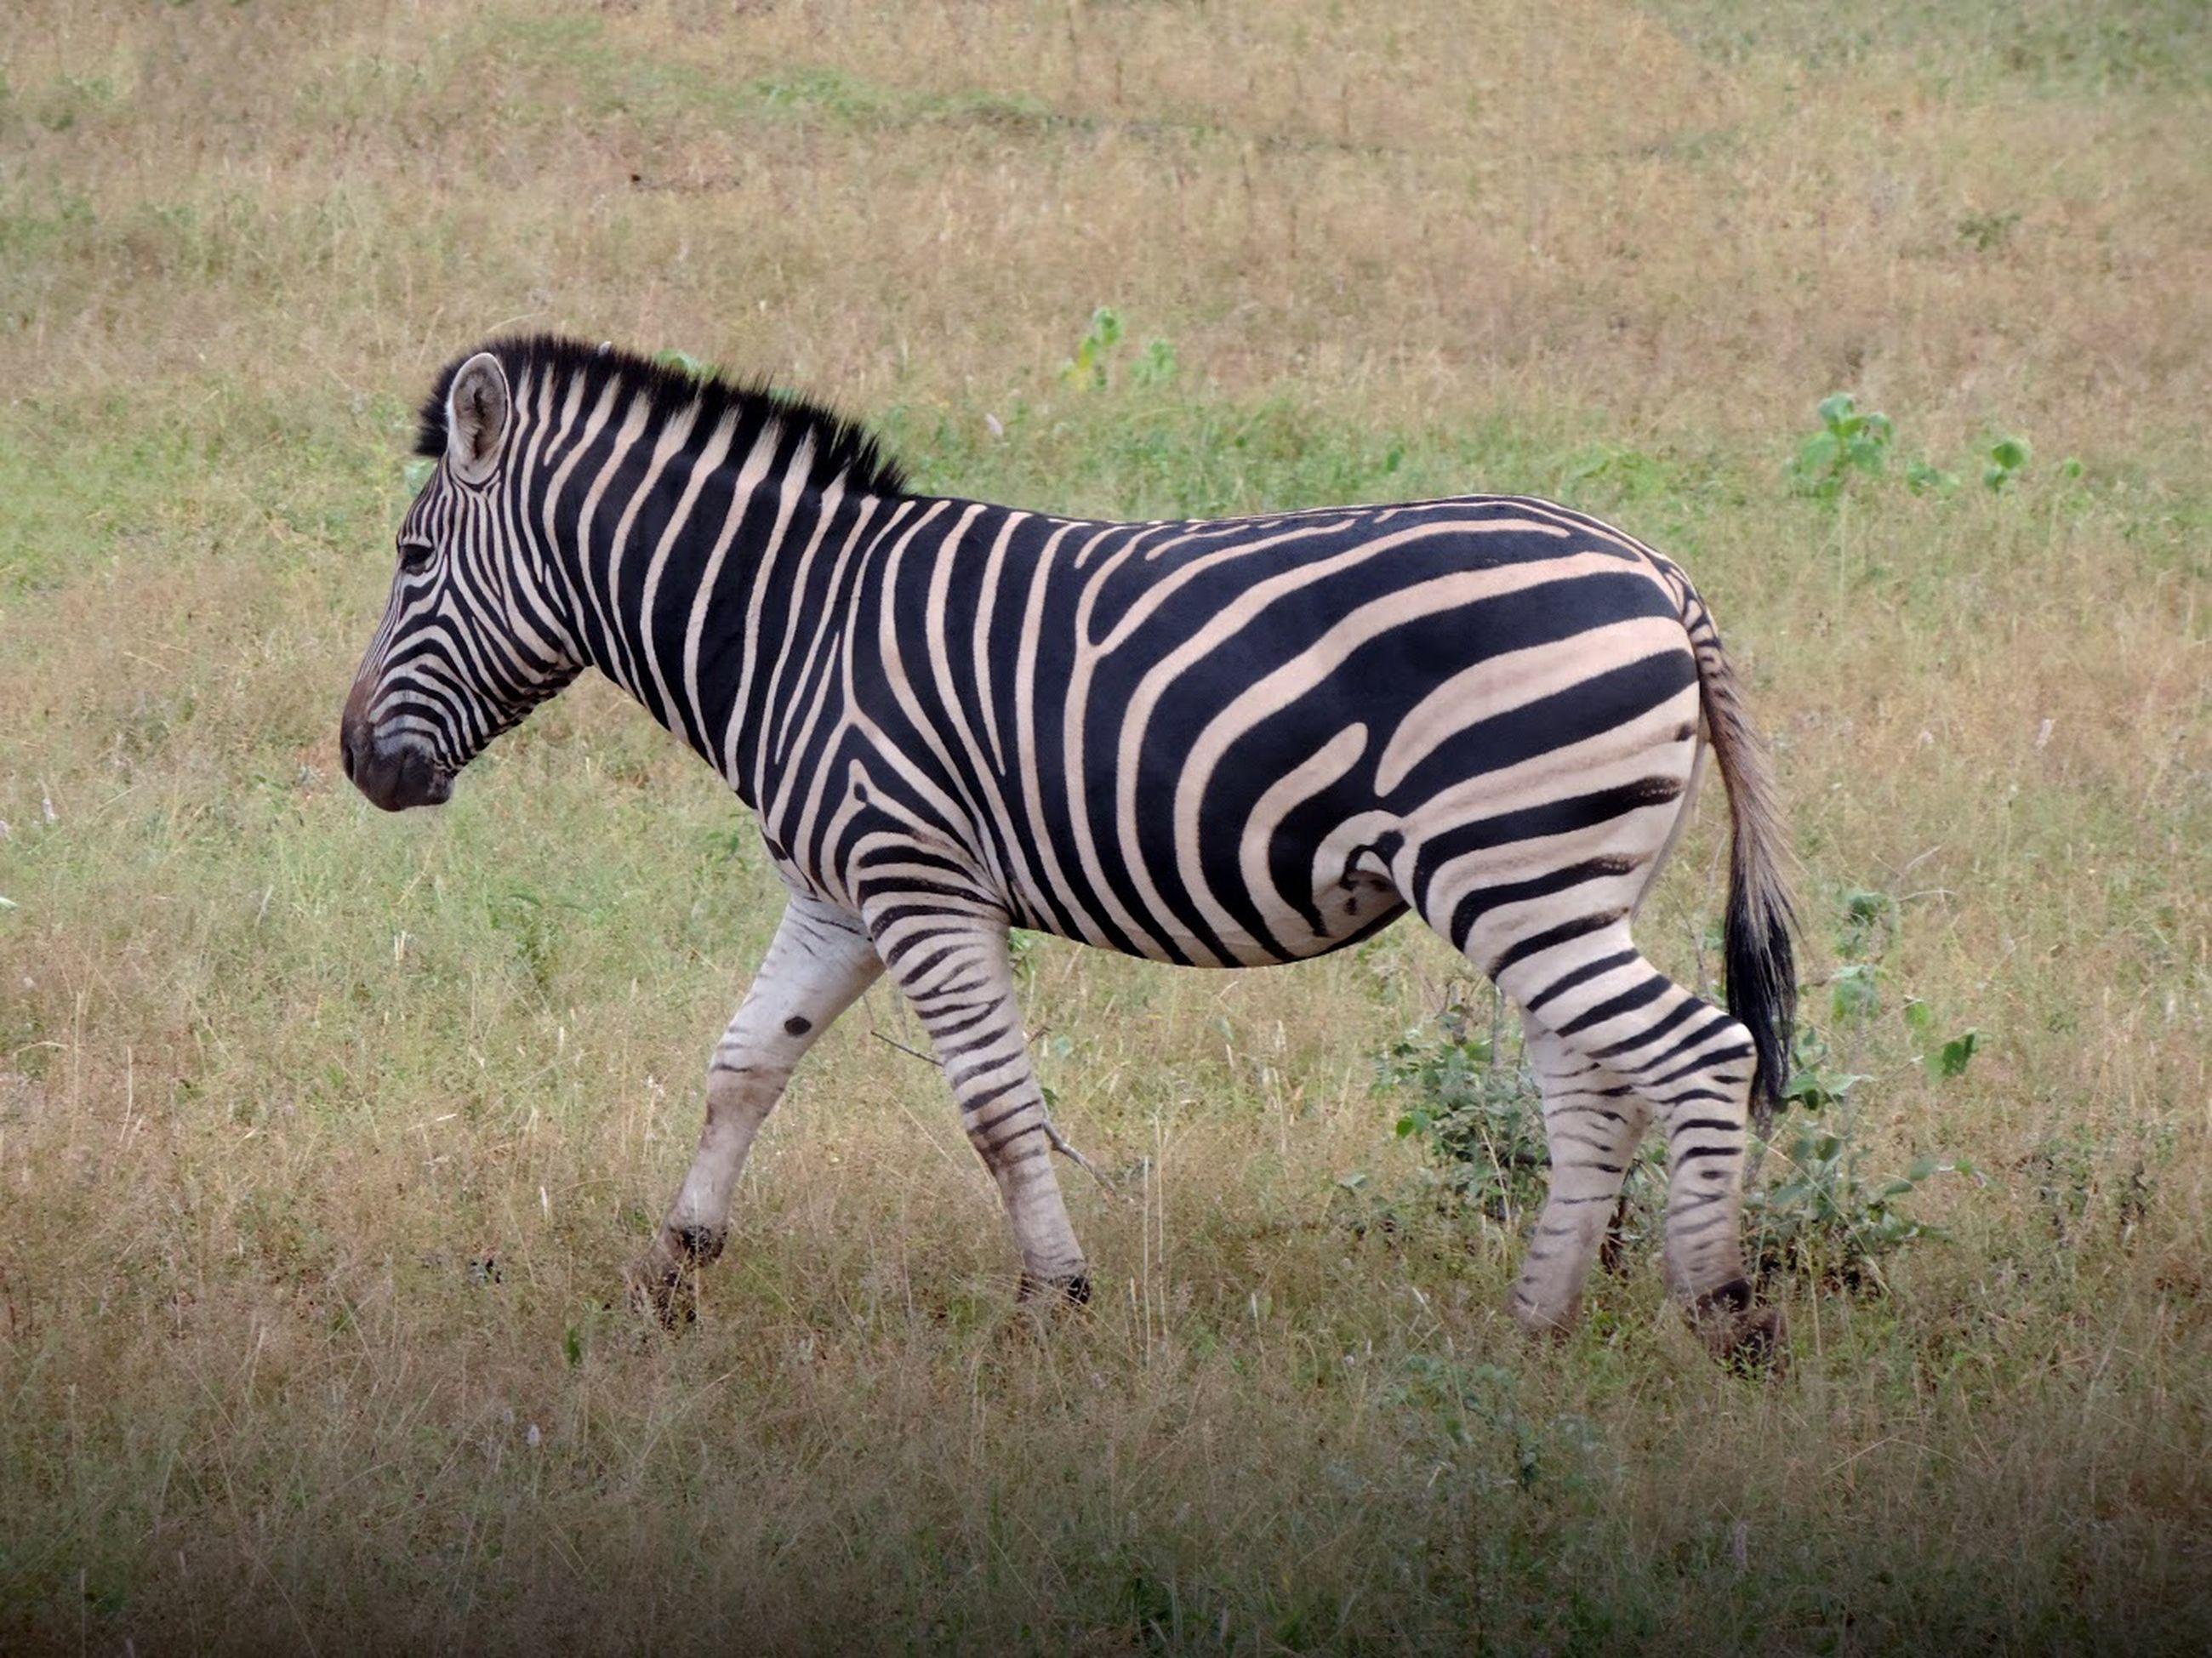 striped, animal wildlife, animal, animal themes, animals in the wild, mammal, zebra, one animal, grass, nature, plant, no people, field, vertebrate, safari, land, herbivorous, standing, domestic animals, animal markings, outdoors